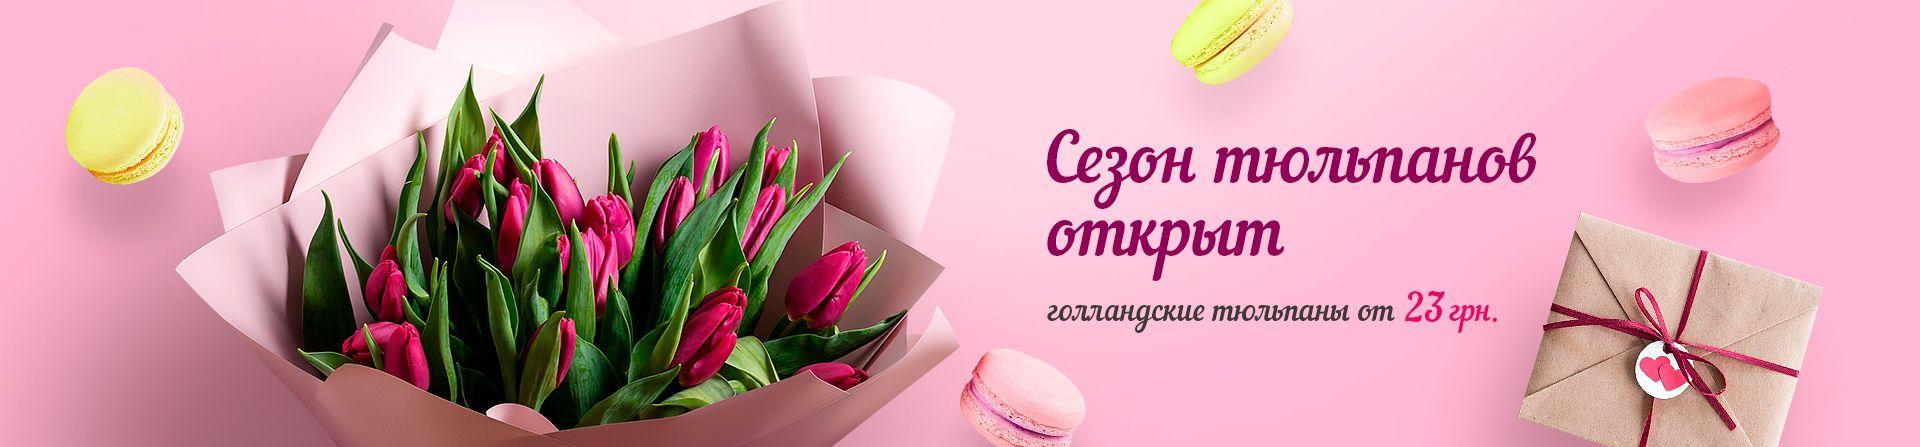 51 красная роза Харьков